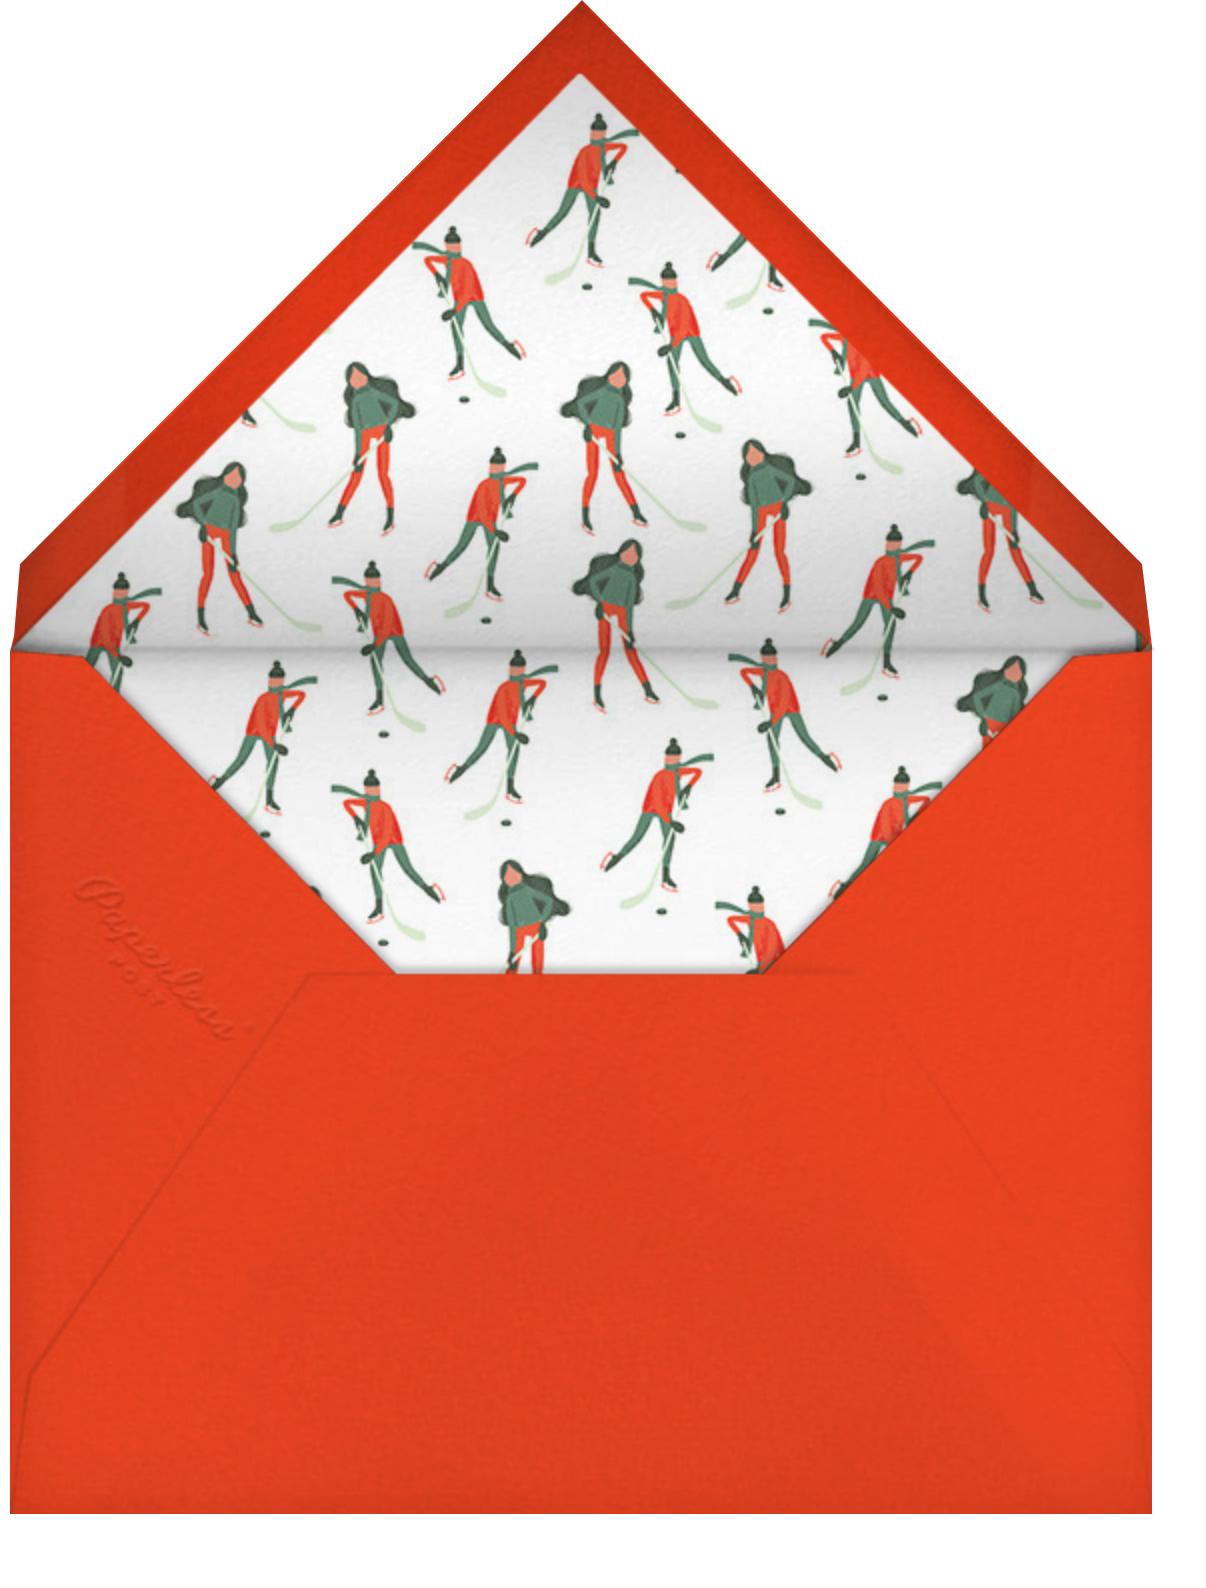 Holiday Hockey (Horizontal) - online at Paperless Post